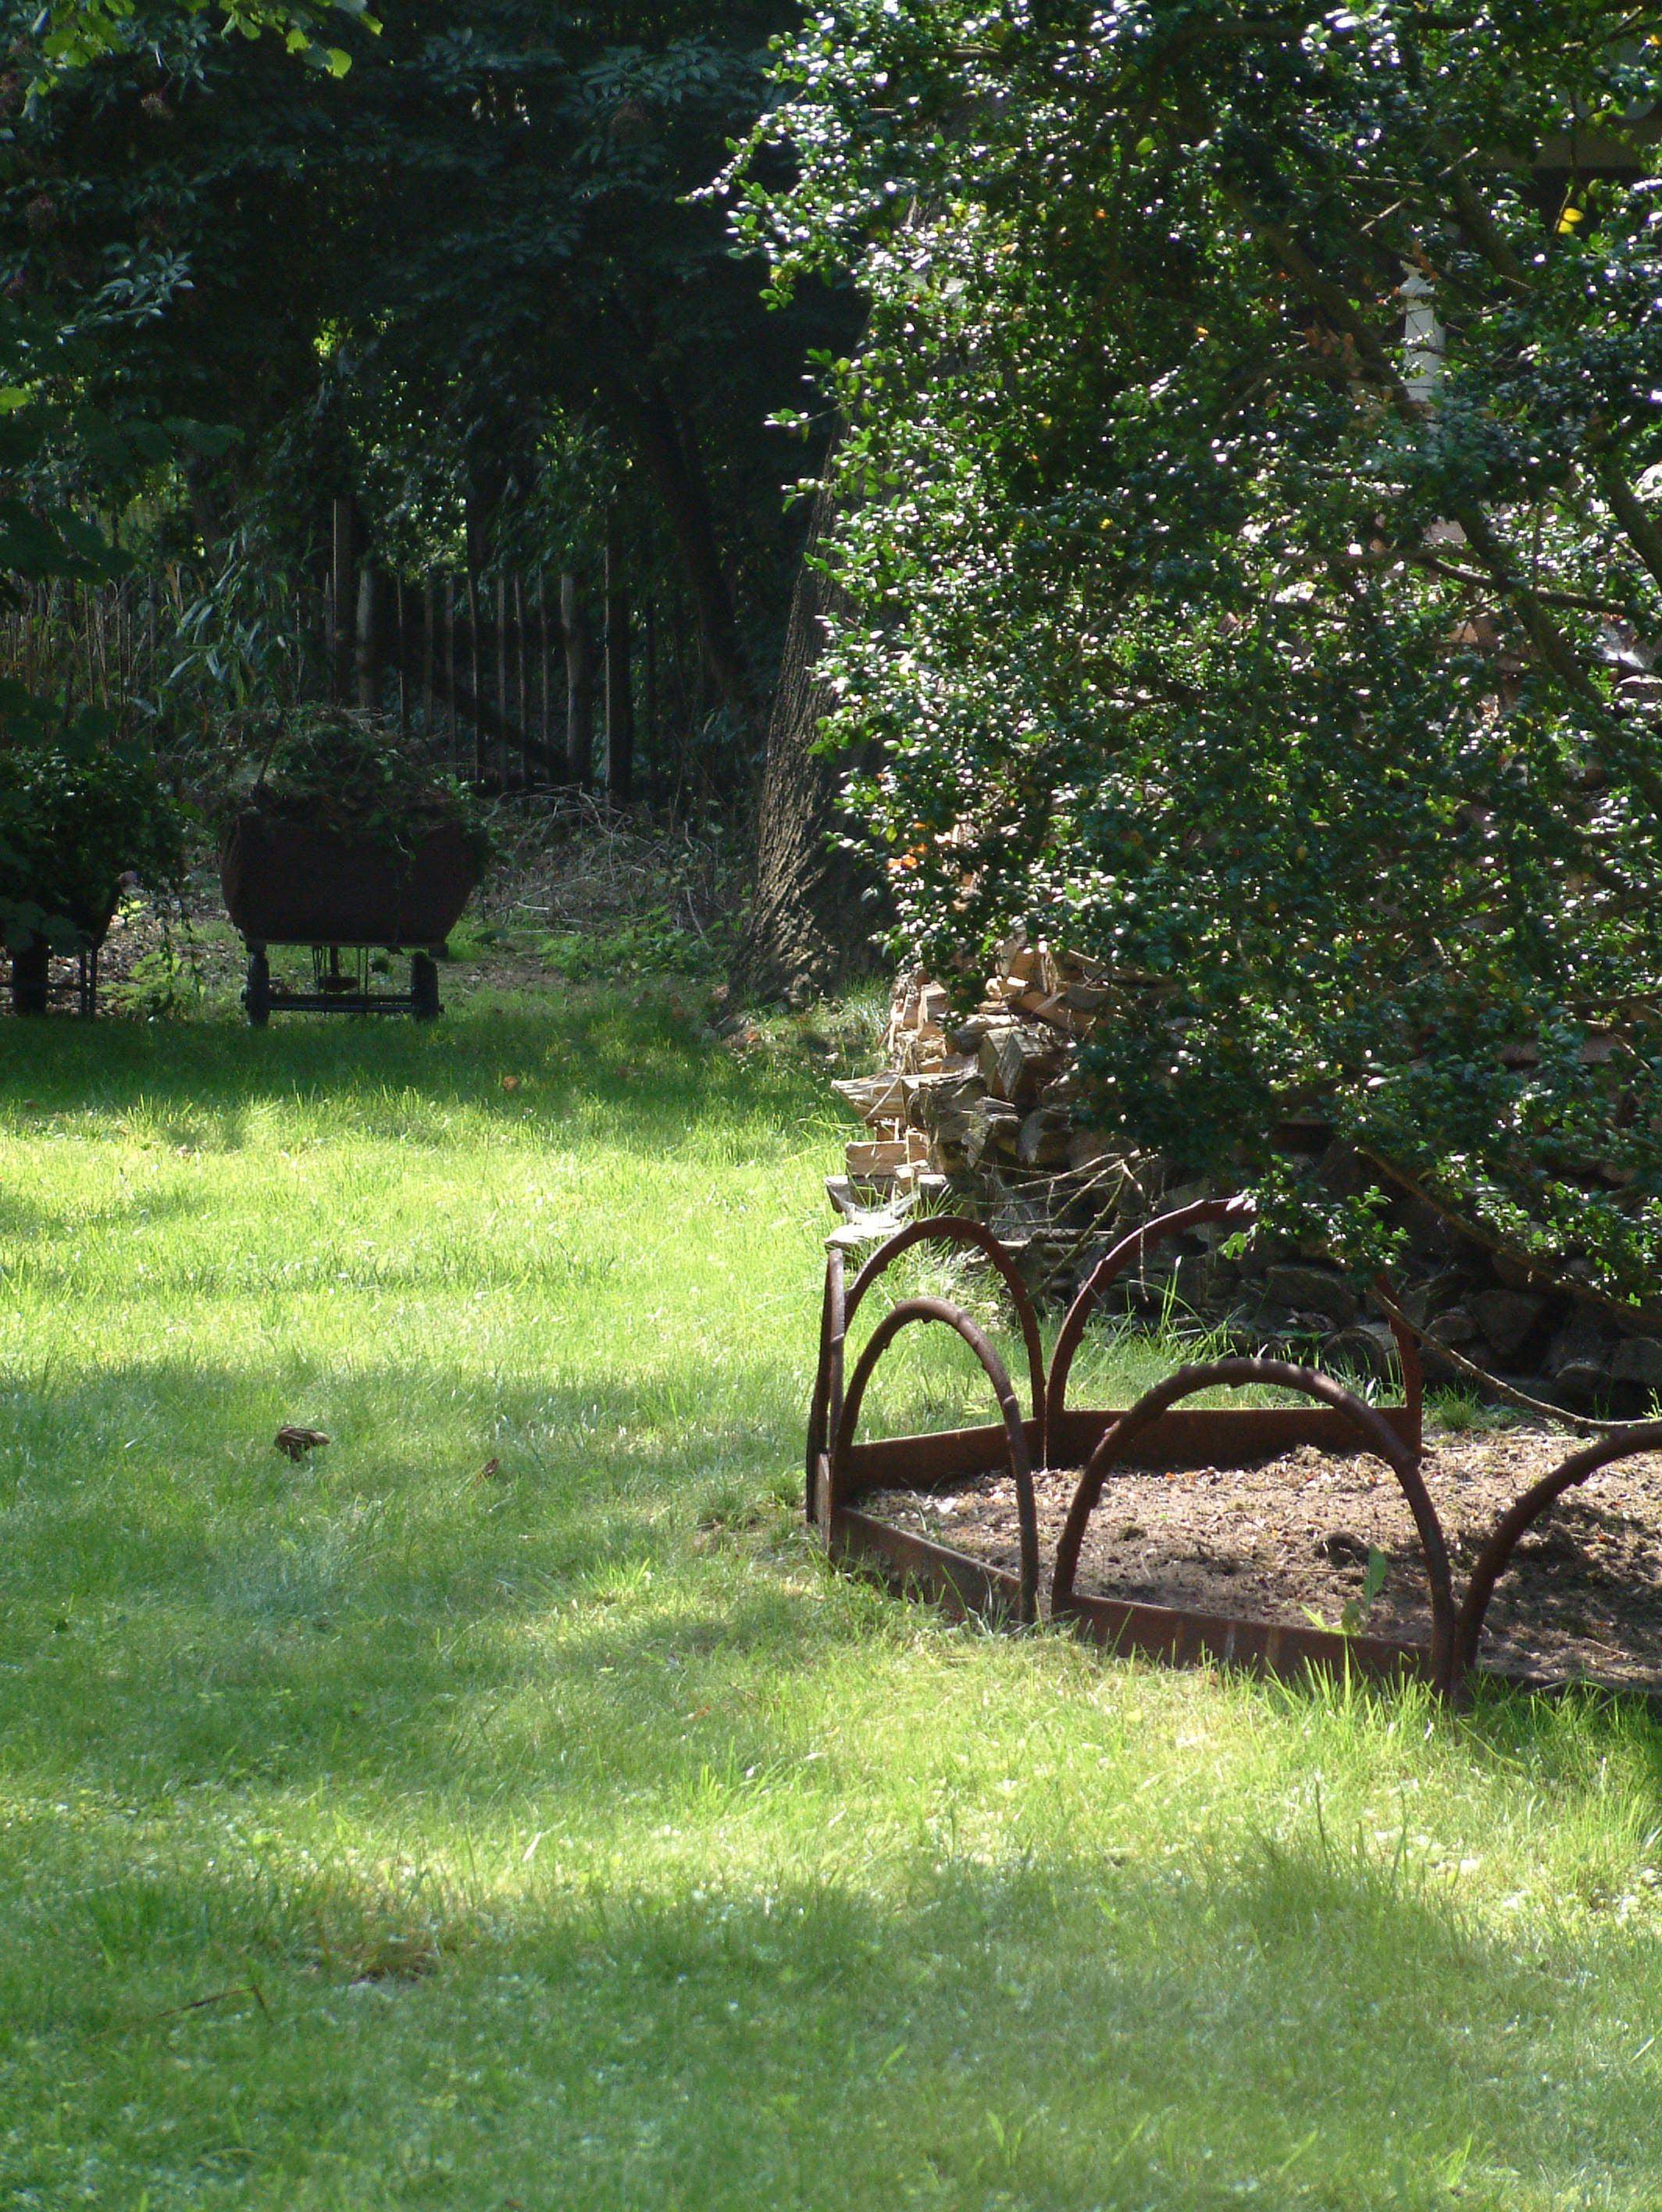 bordurette bordes de jard n de tradewinds architonic. Black Bedroom Furniture Sets. Home Design Ideas